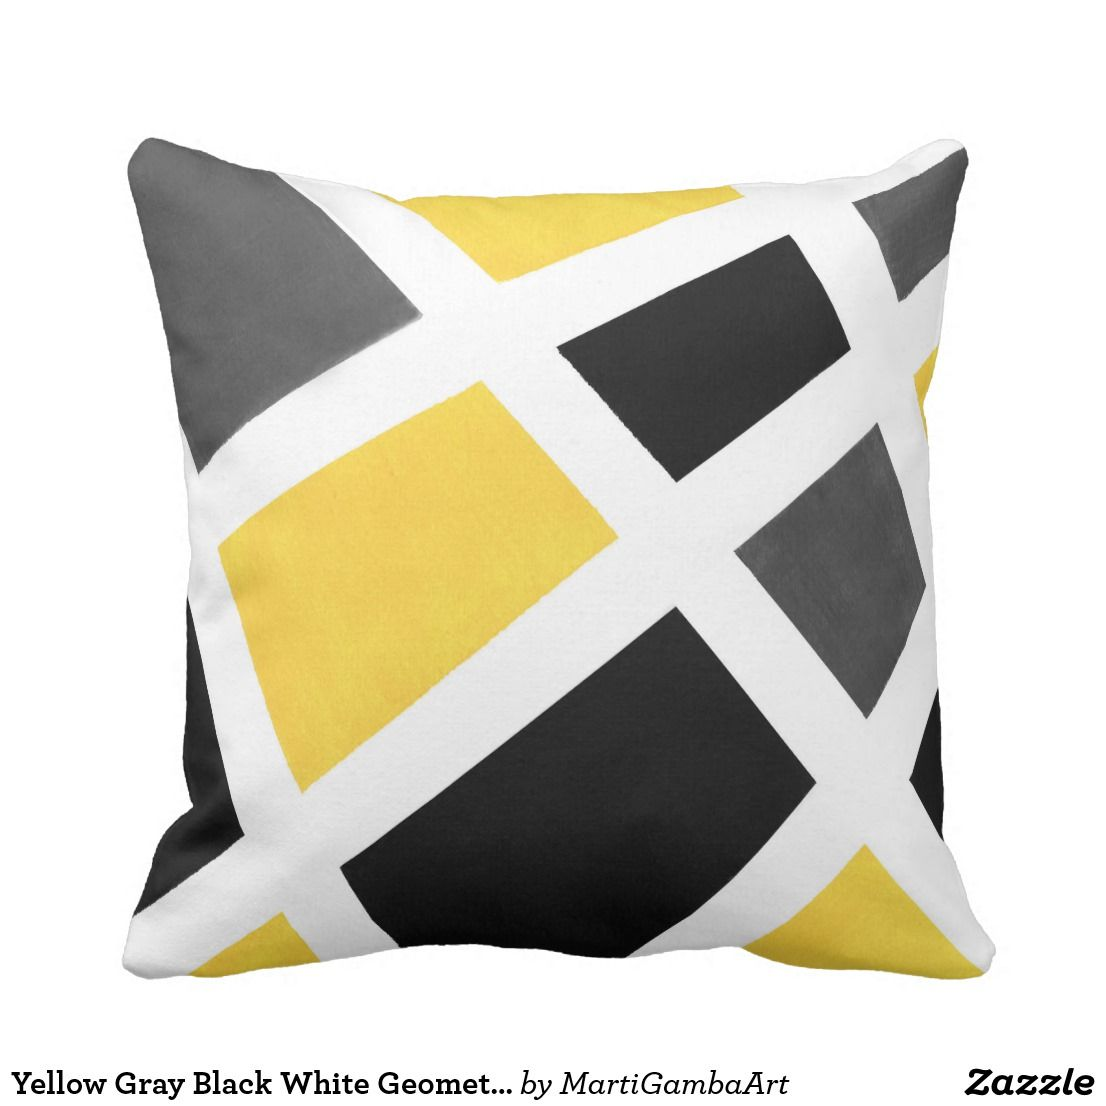 Yellow Gray Black White Geometric Throw Pillow Zazzle Com